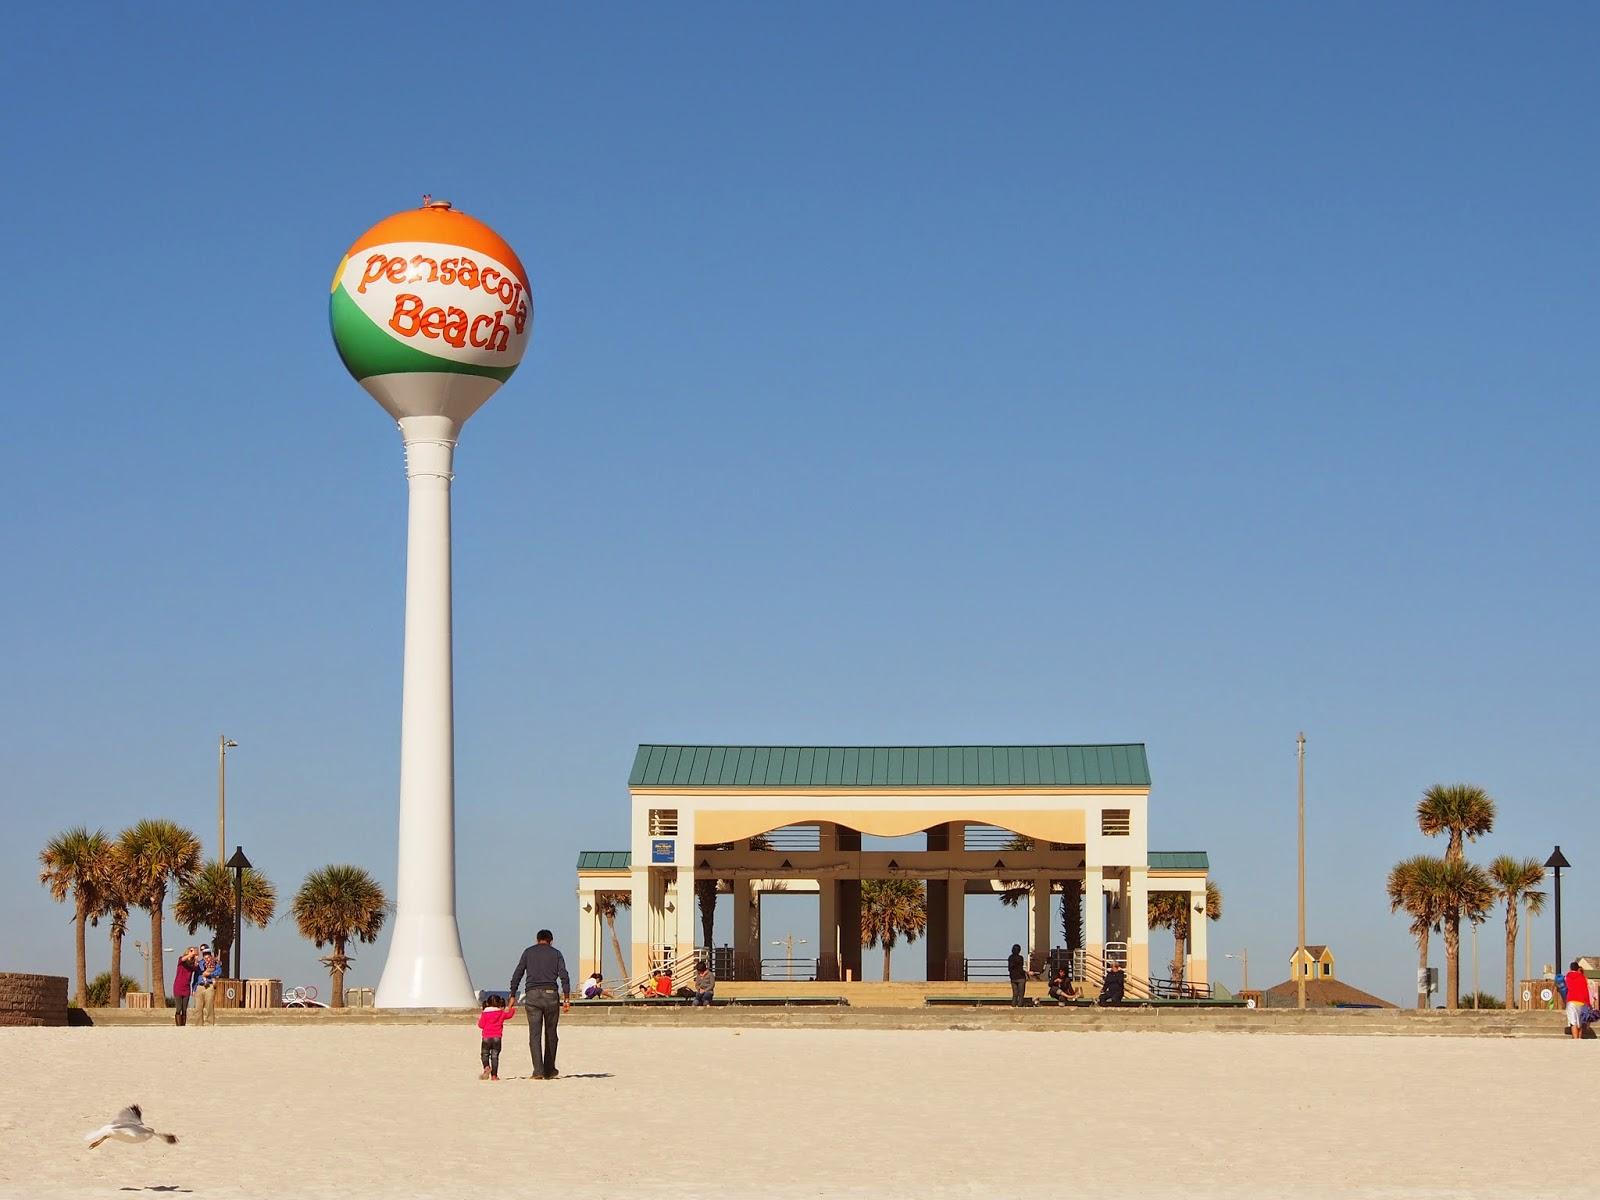 And Panama Beach Florida Road Trip